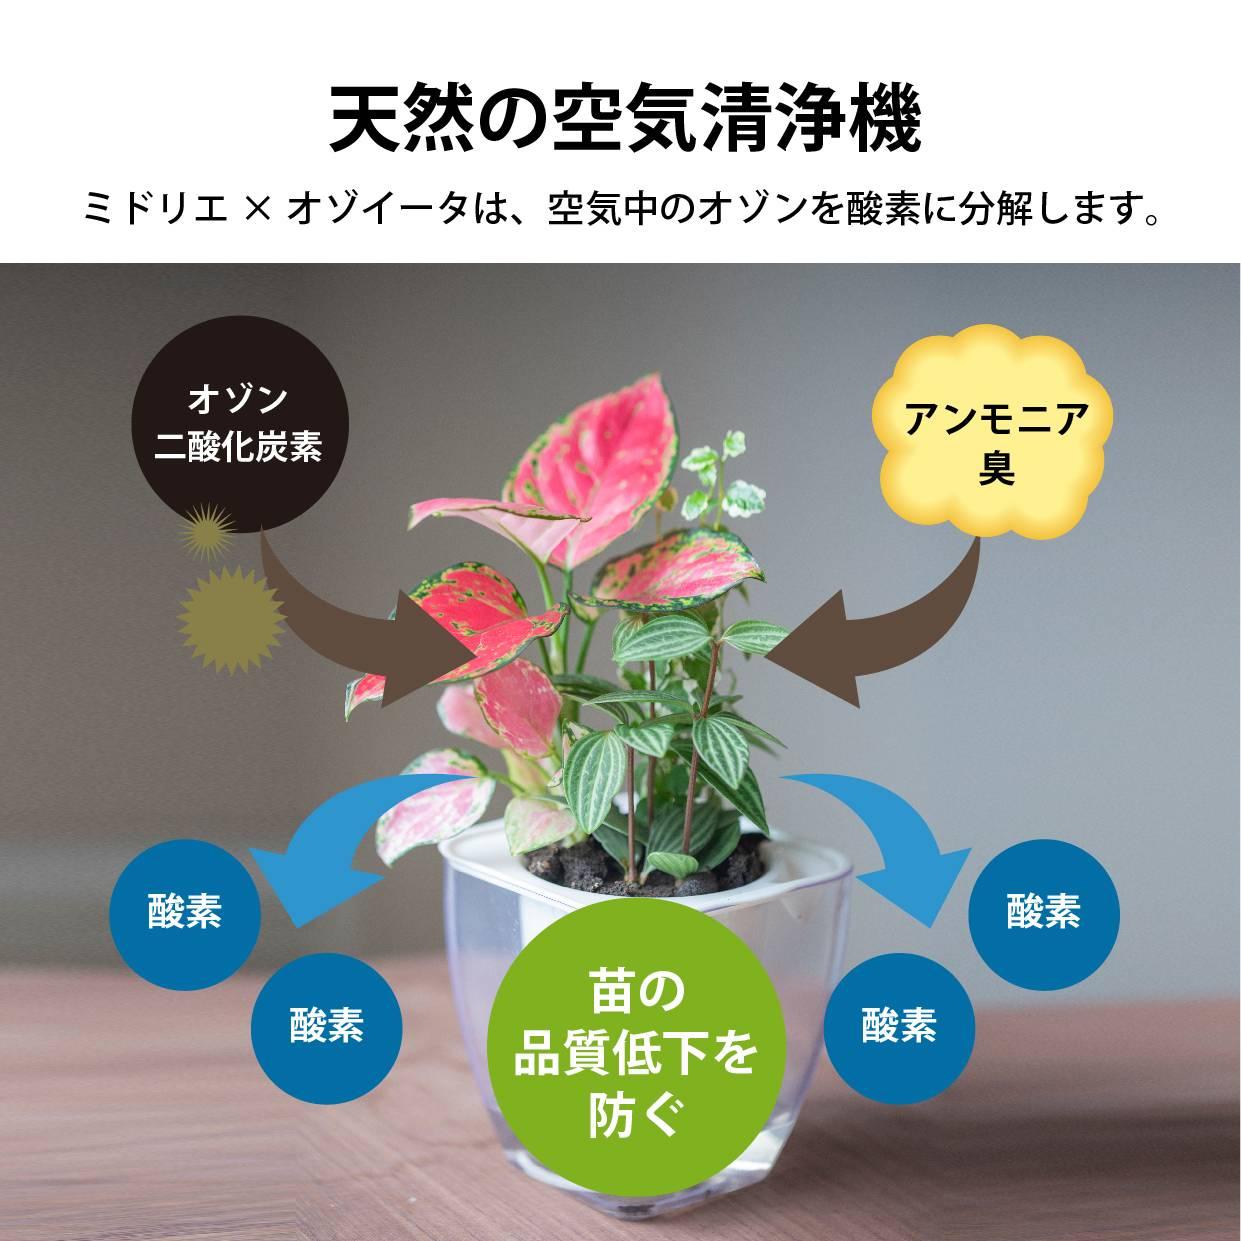 POT-J フィカス エラスティカ ティネケ  【家庭の空気を守る「オゾイータ」仕様】 (オゾイータシート付き)